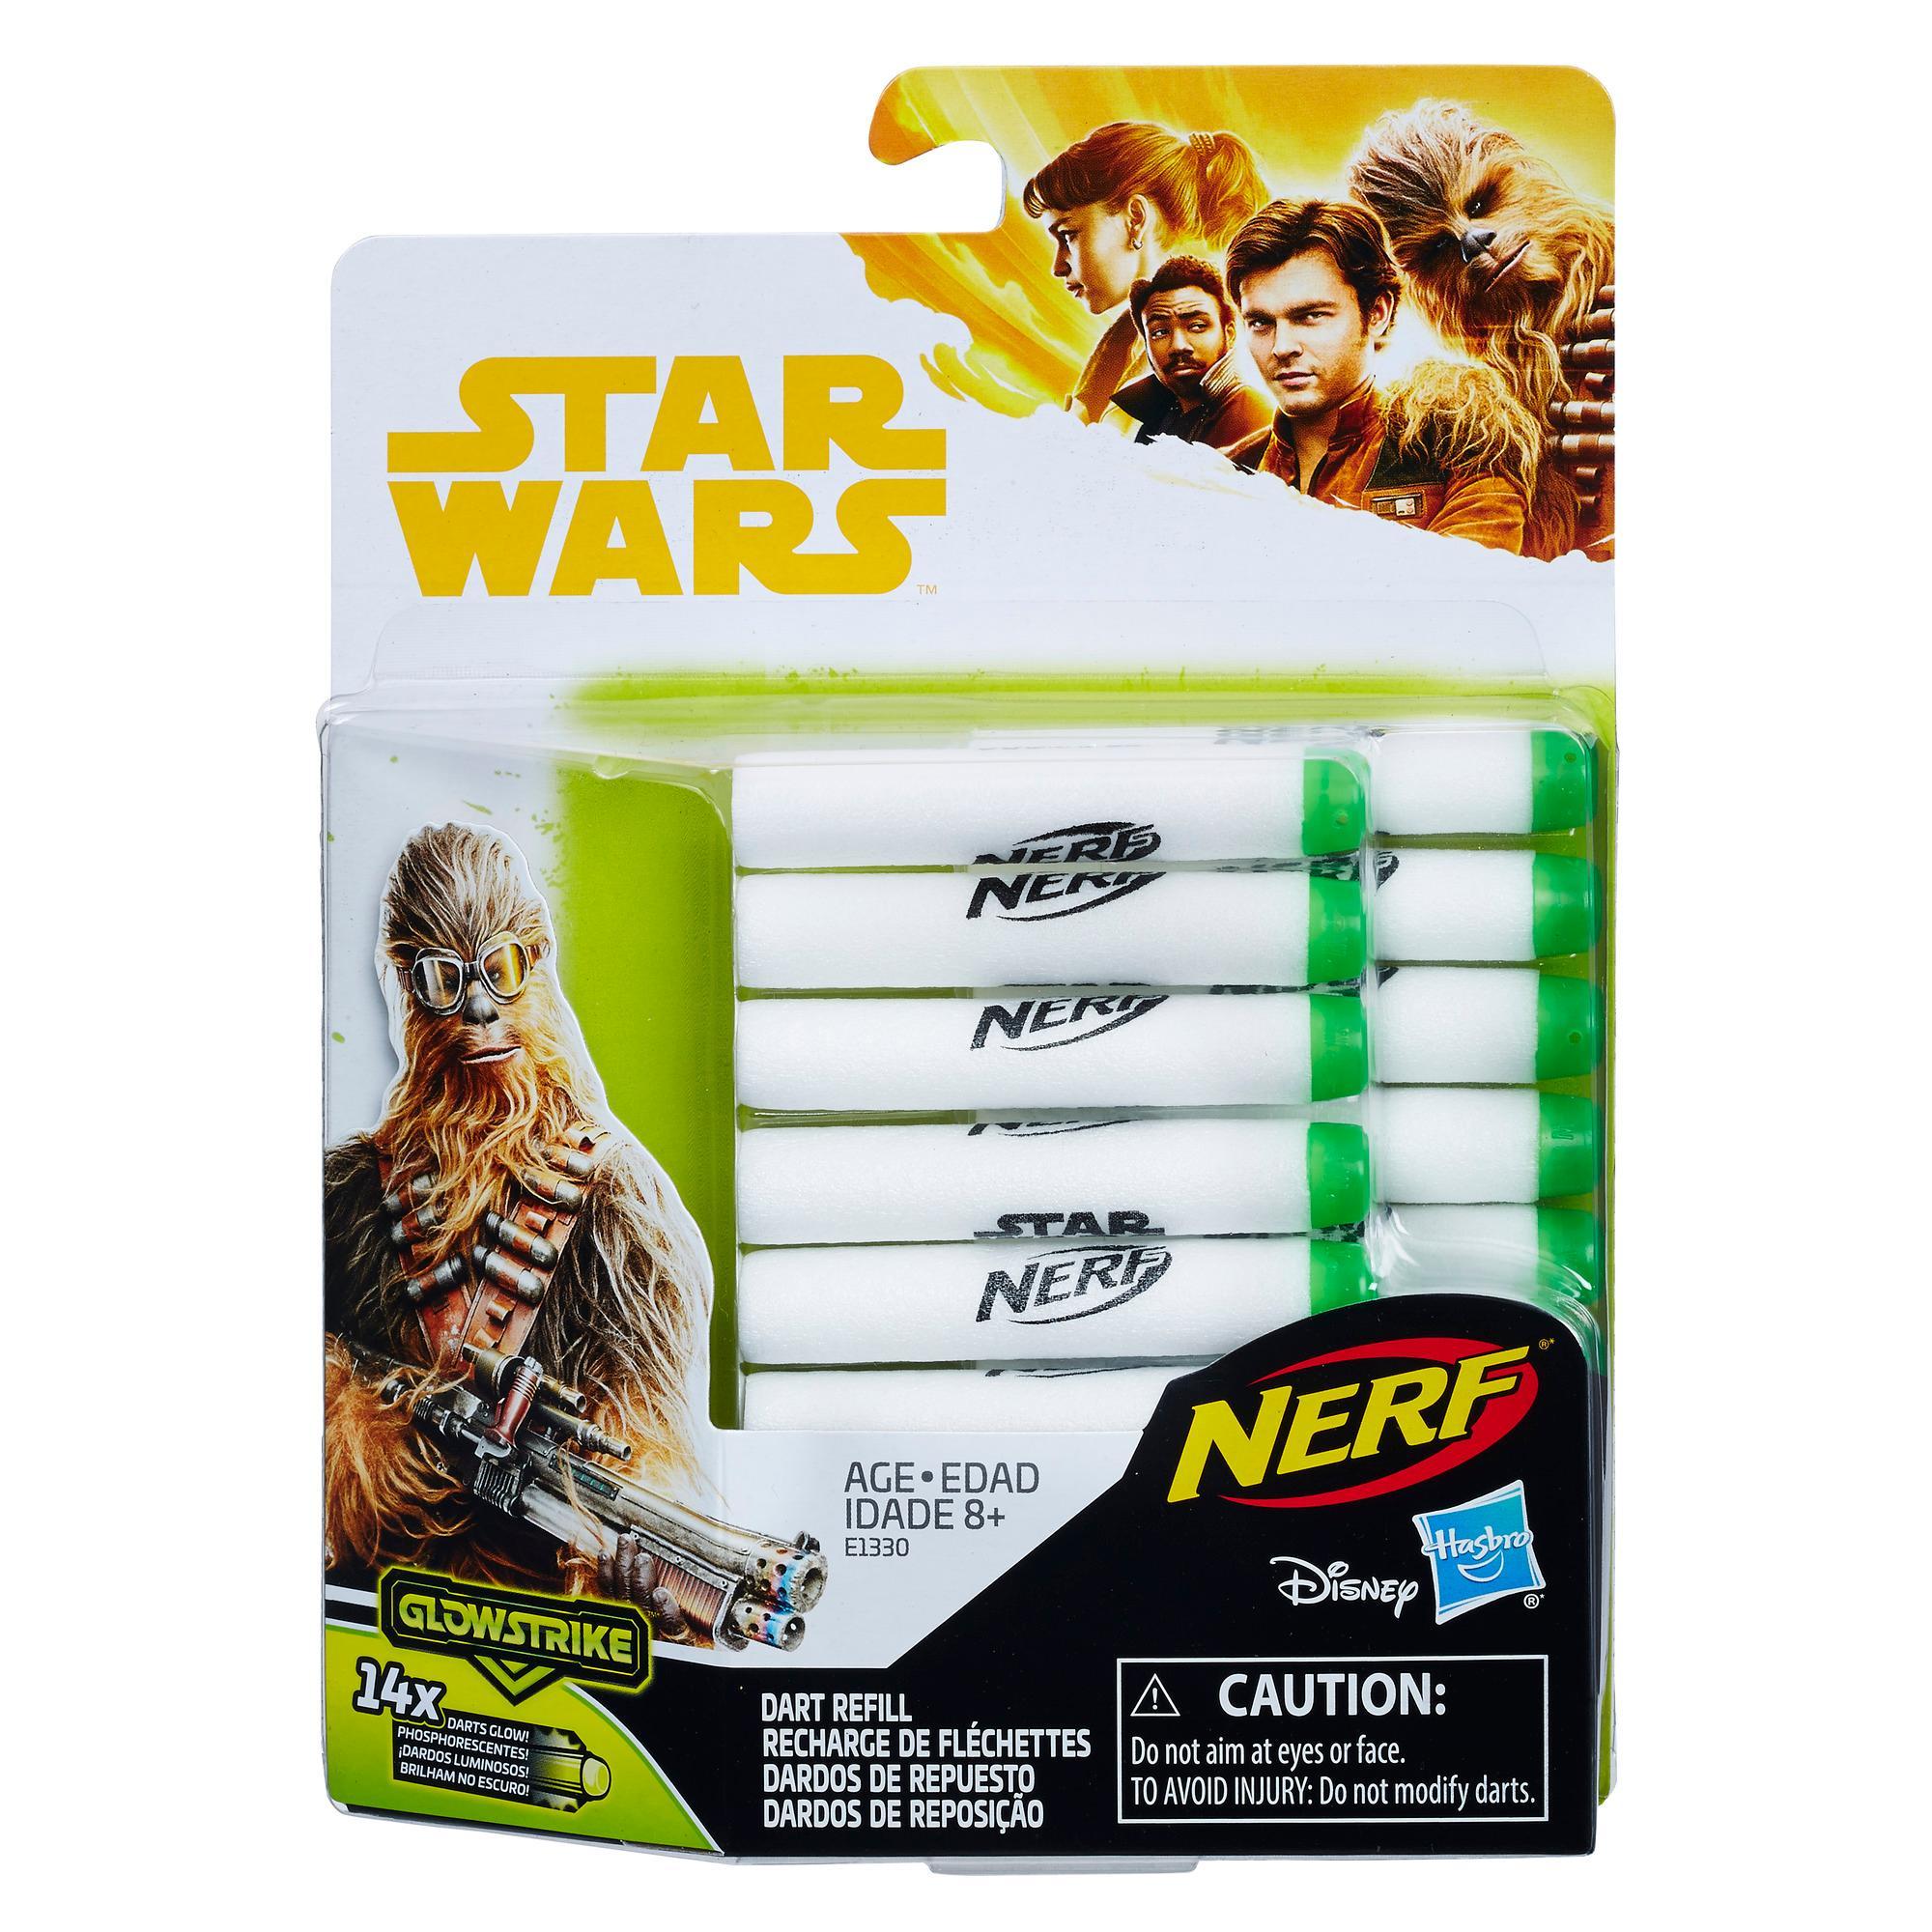 Star Wars Nerf - Recharge de fléchettes GlowStrike